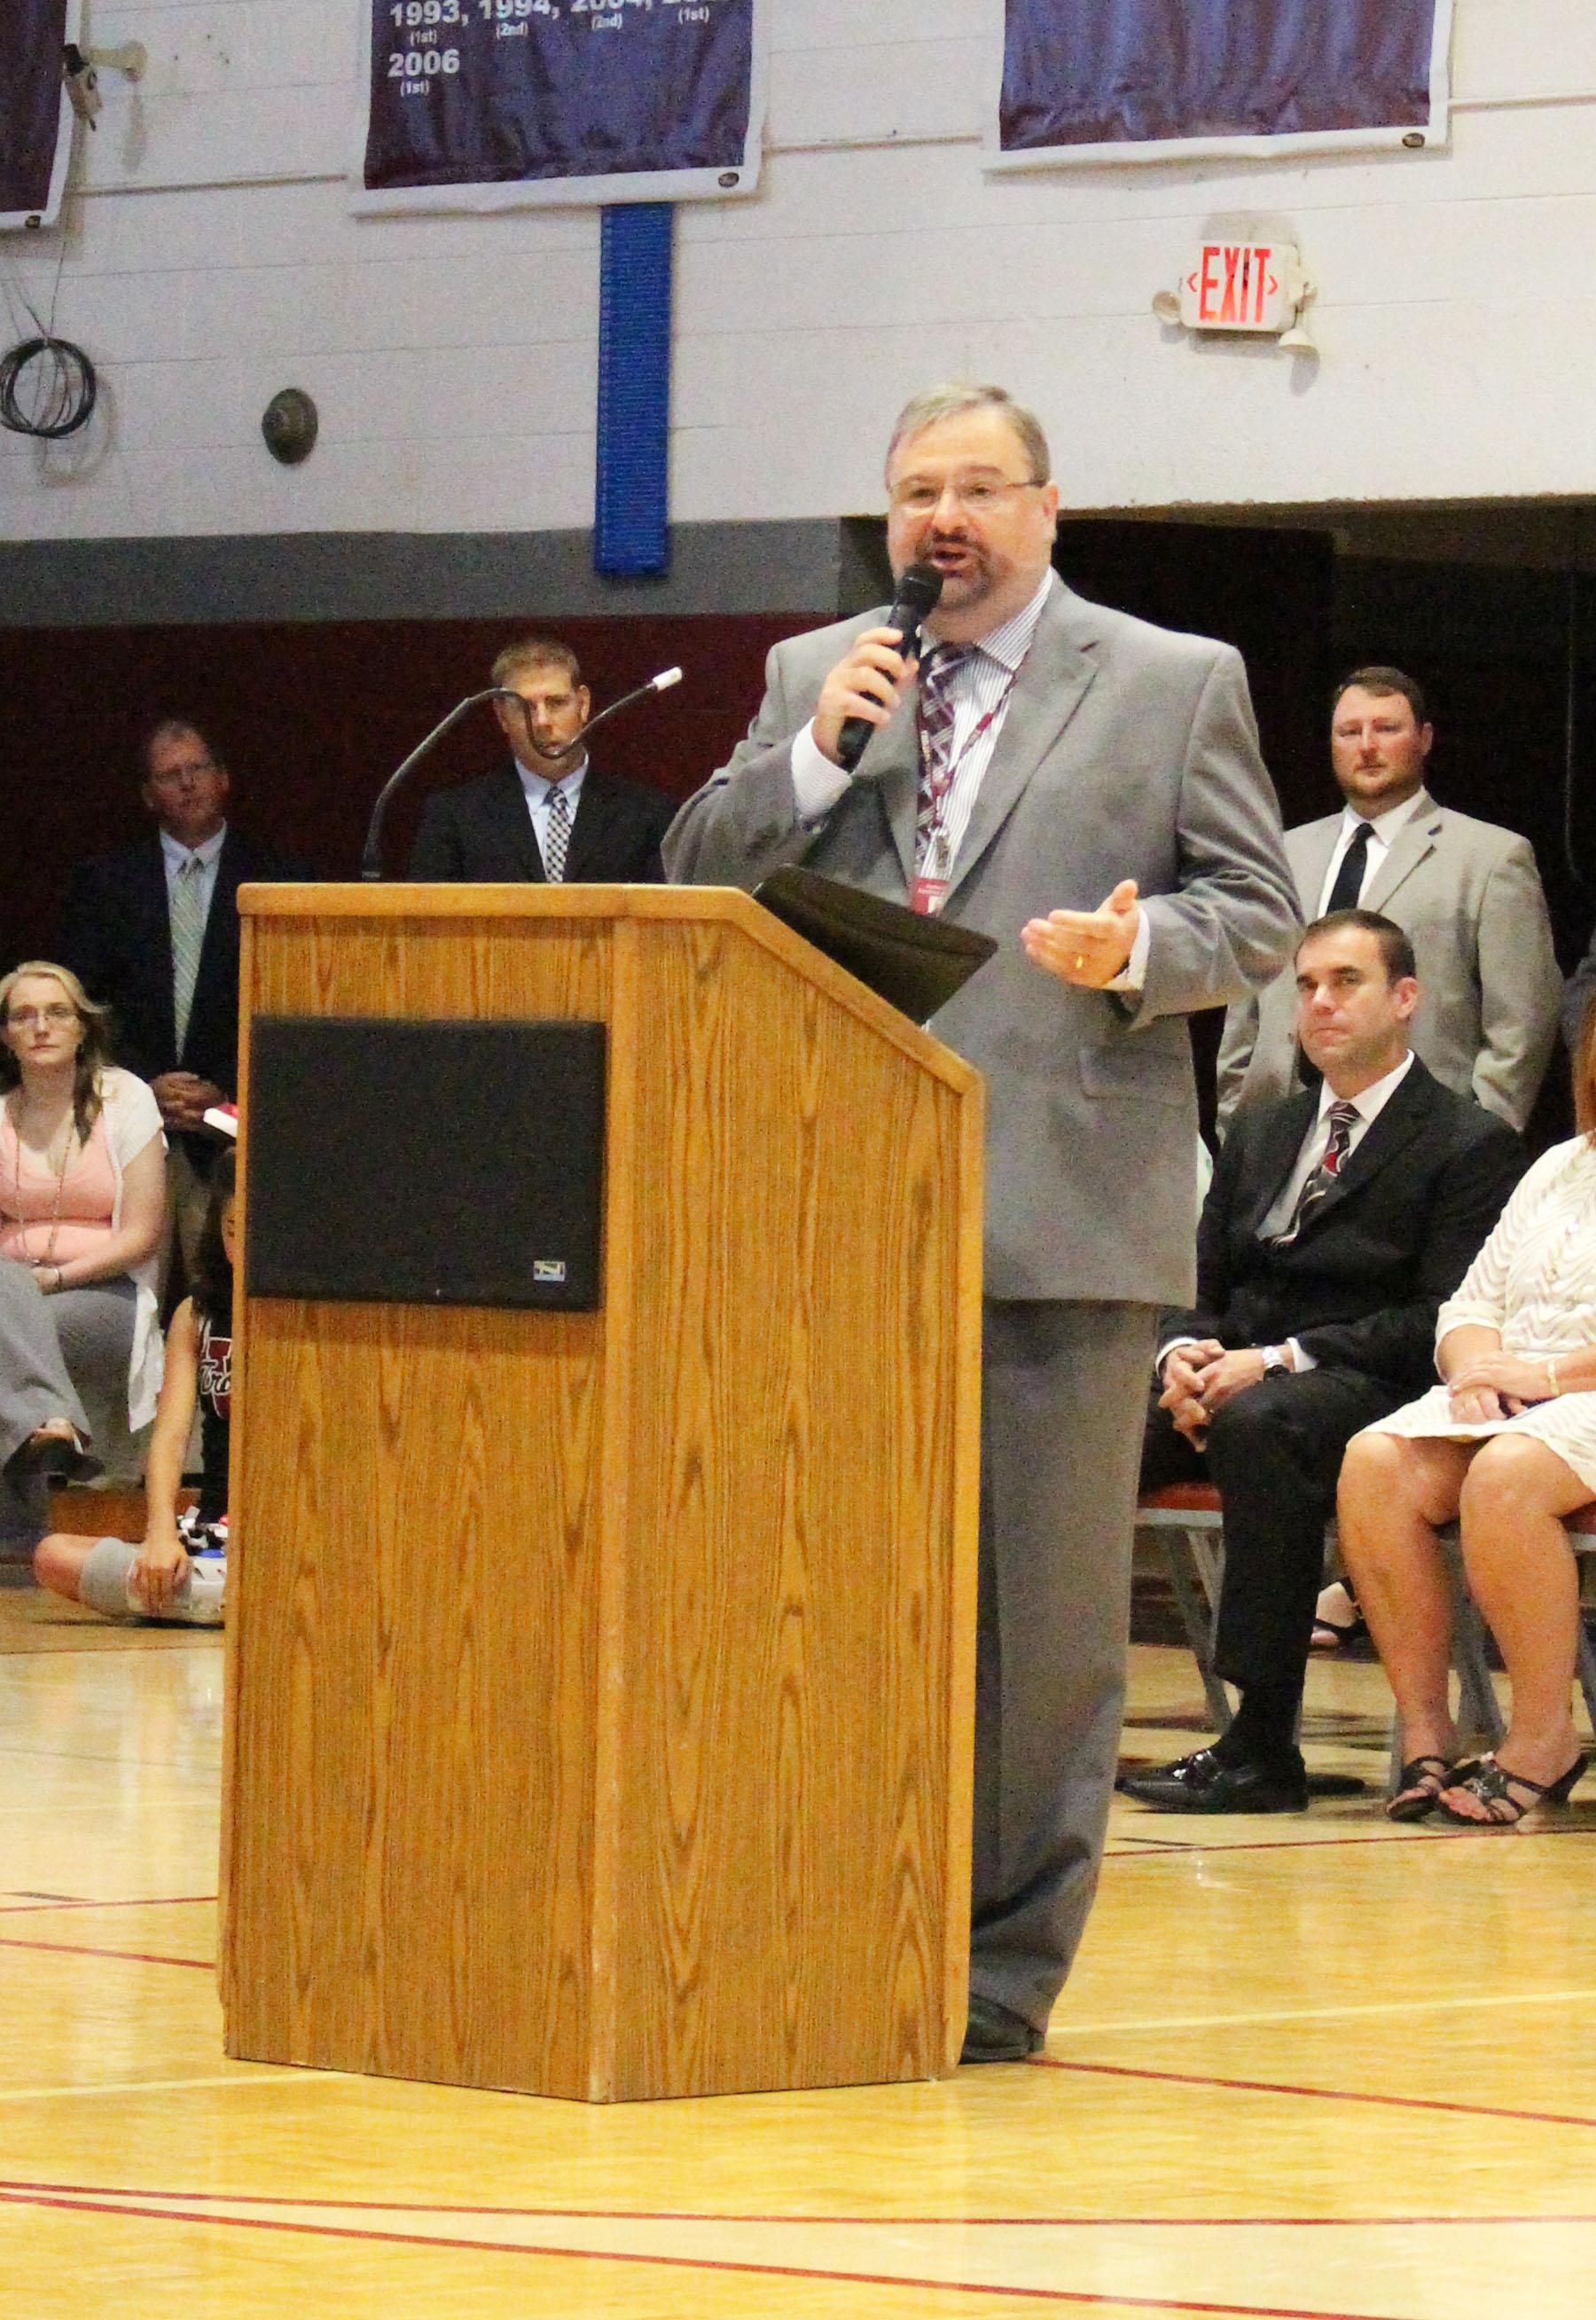 Mr. Kinsler, principal